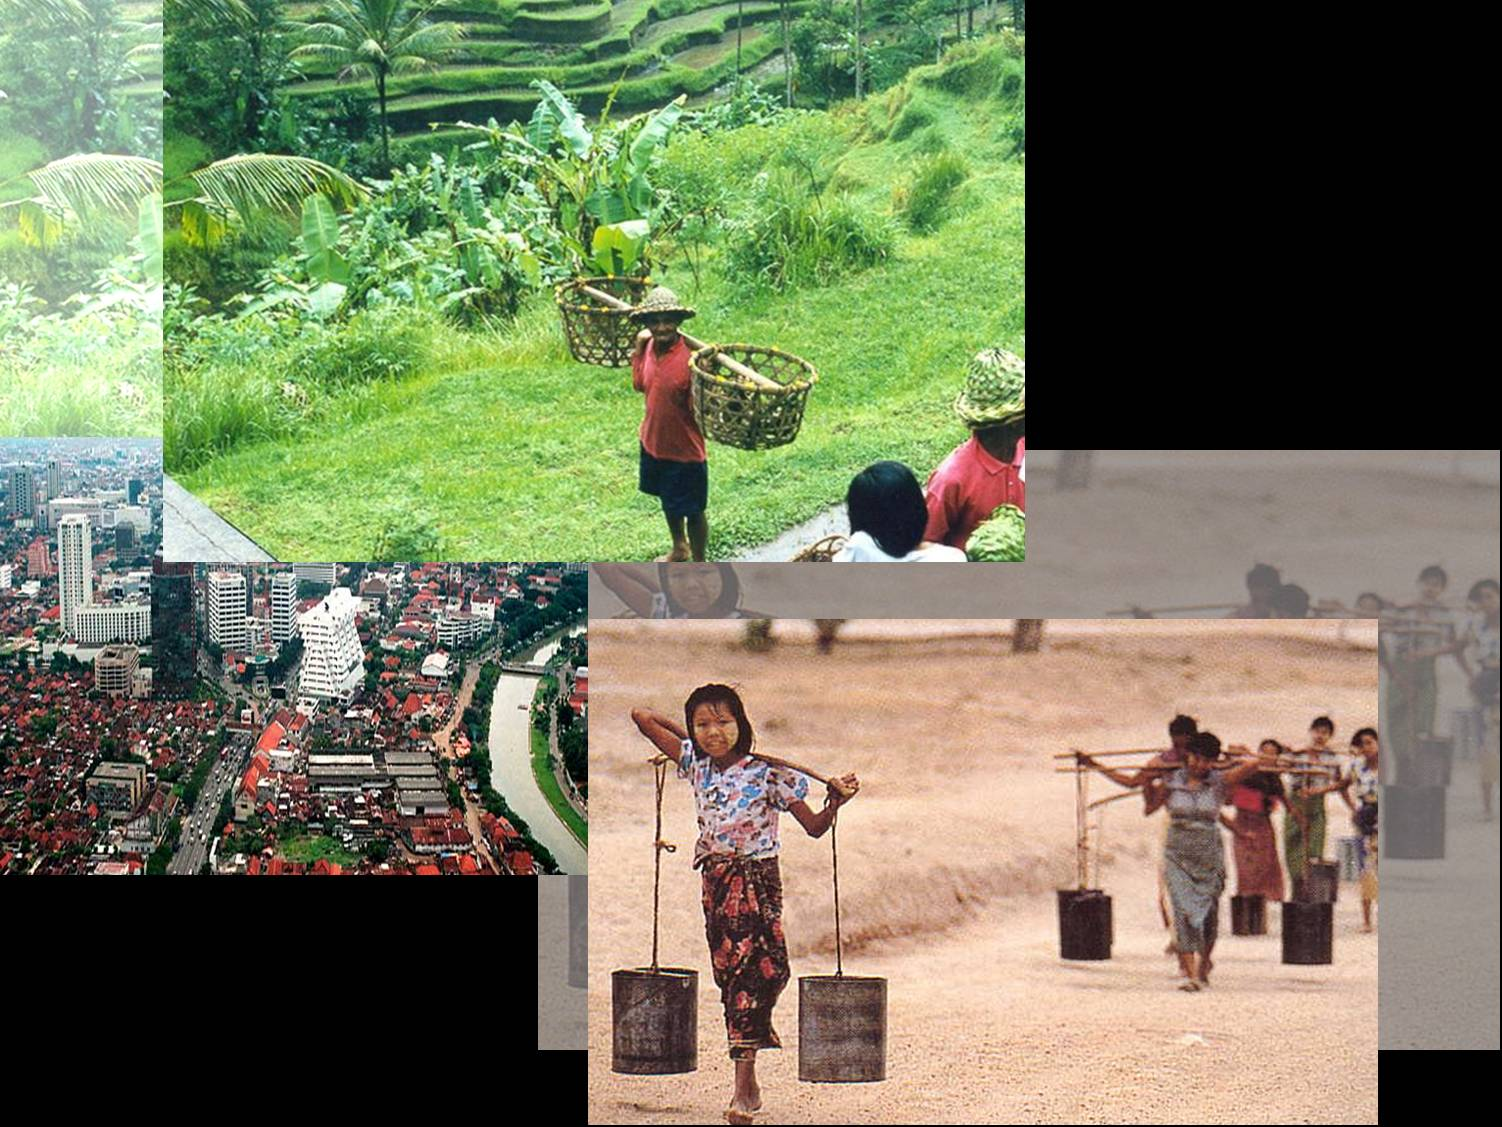 Pemanfaatan Sumber Daya Alam All About Environment